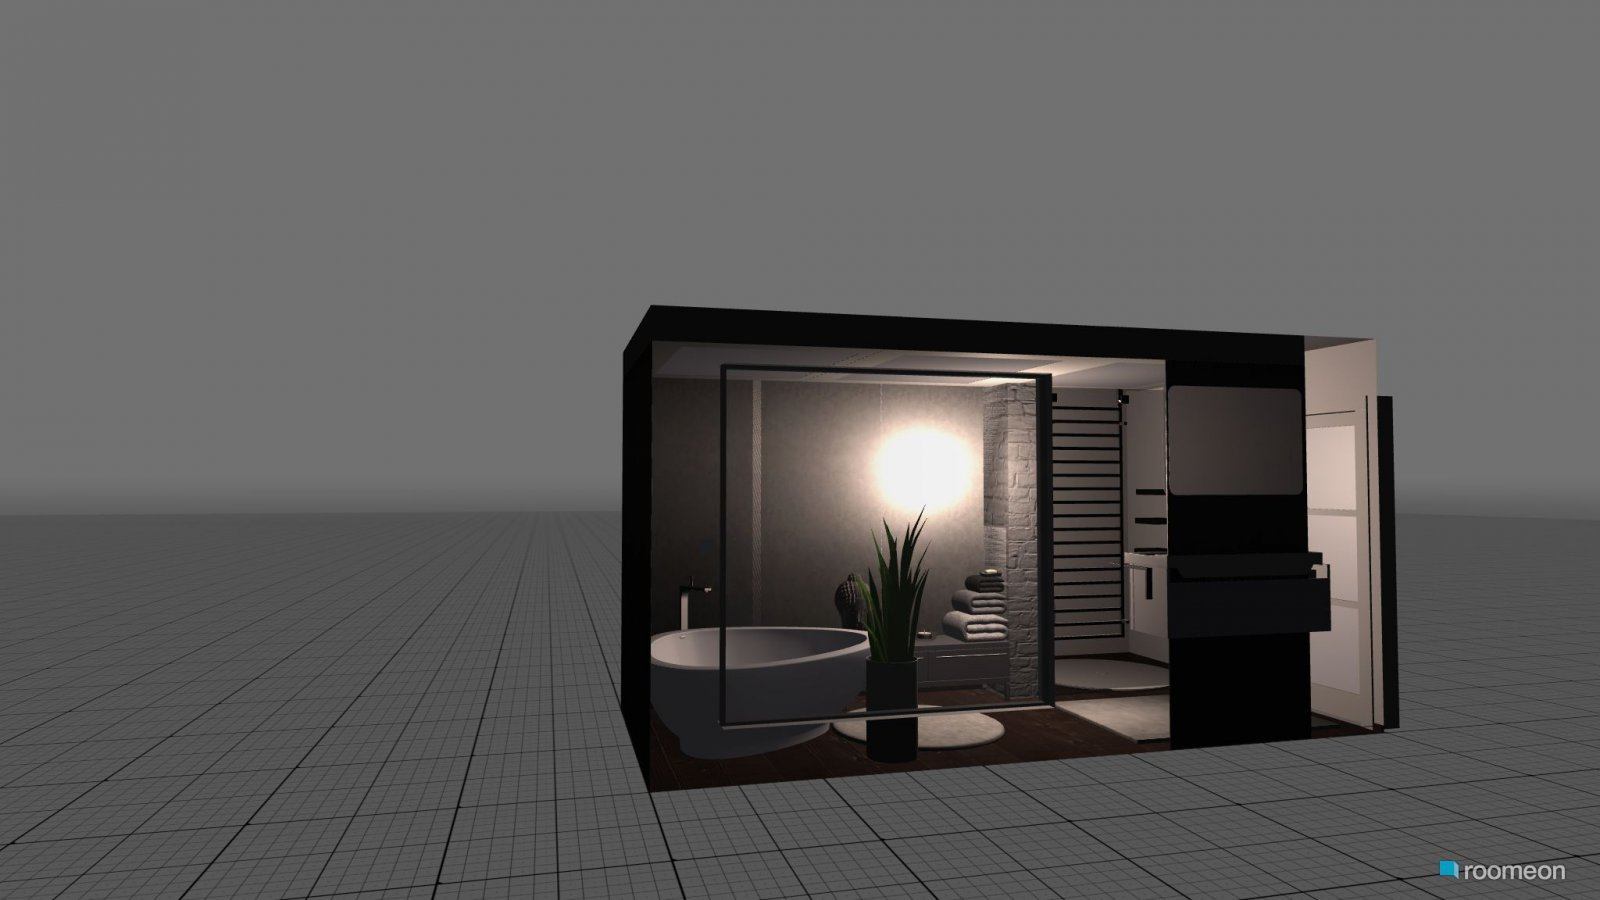 Room Design Badezimmer grau-weiss-braun - roomeon Community